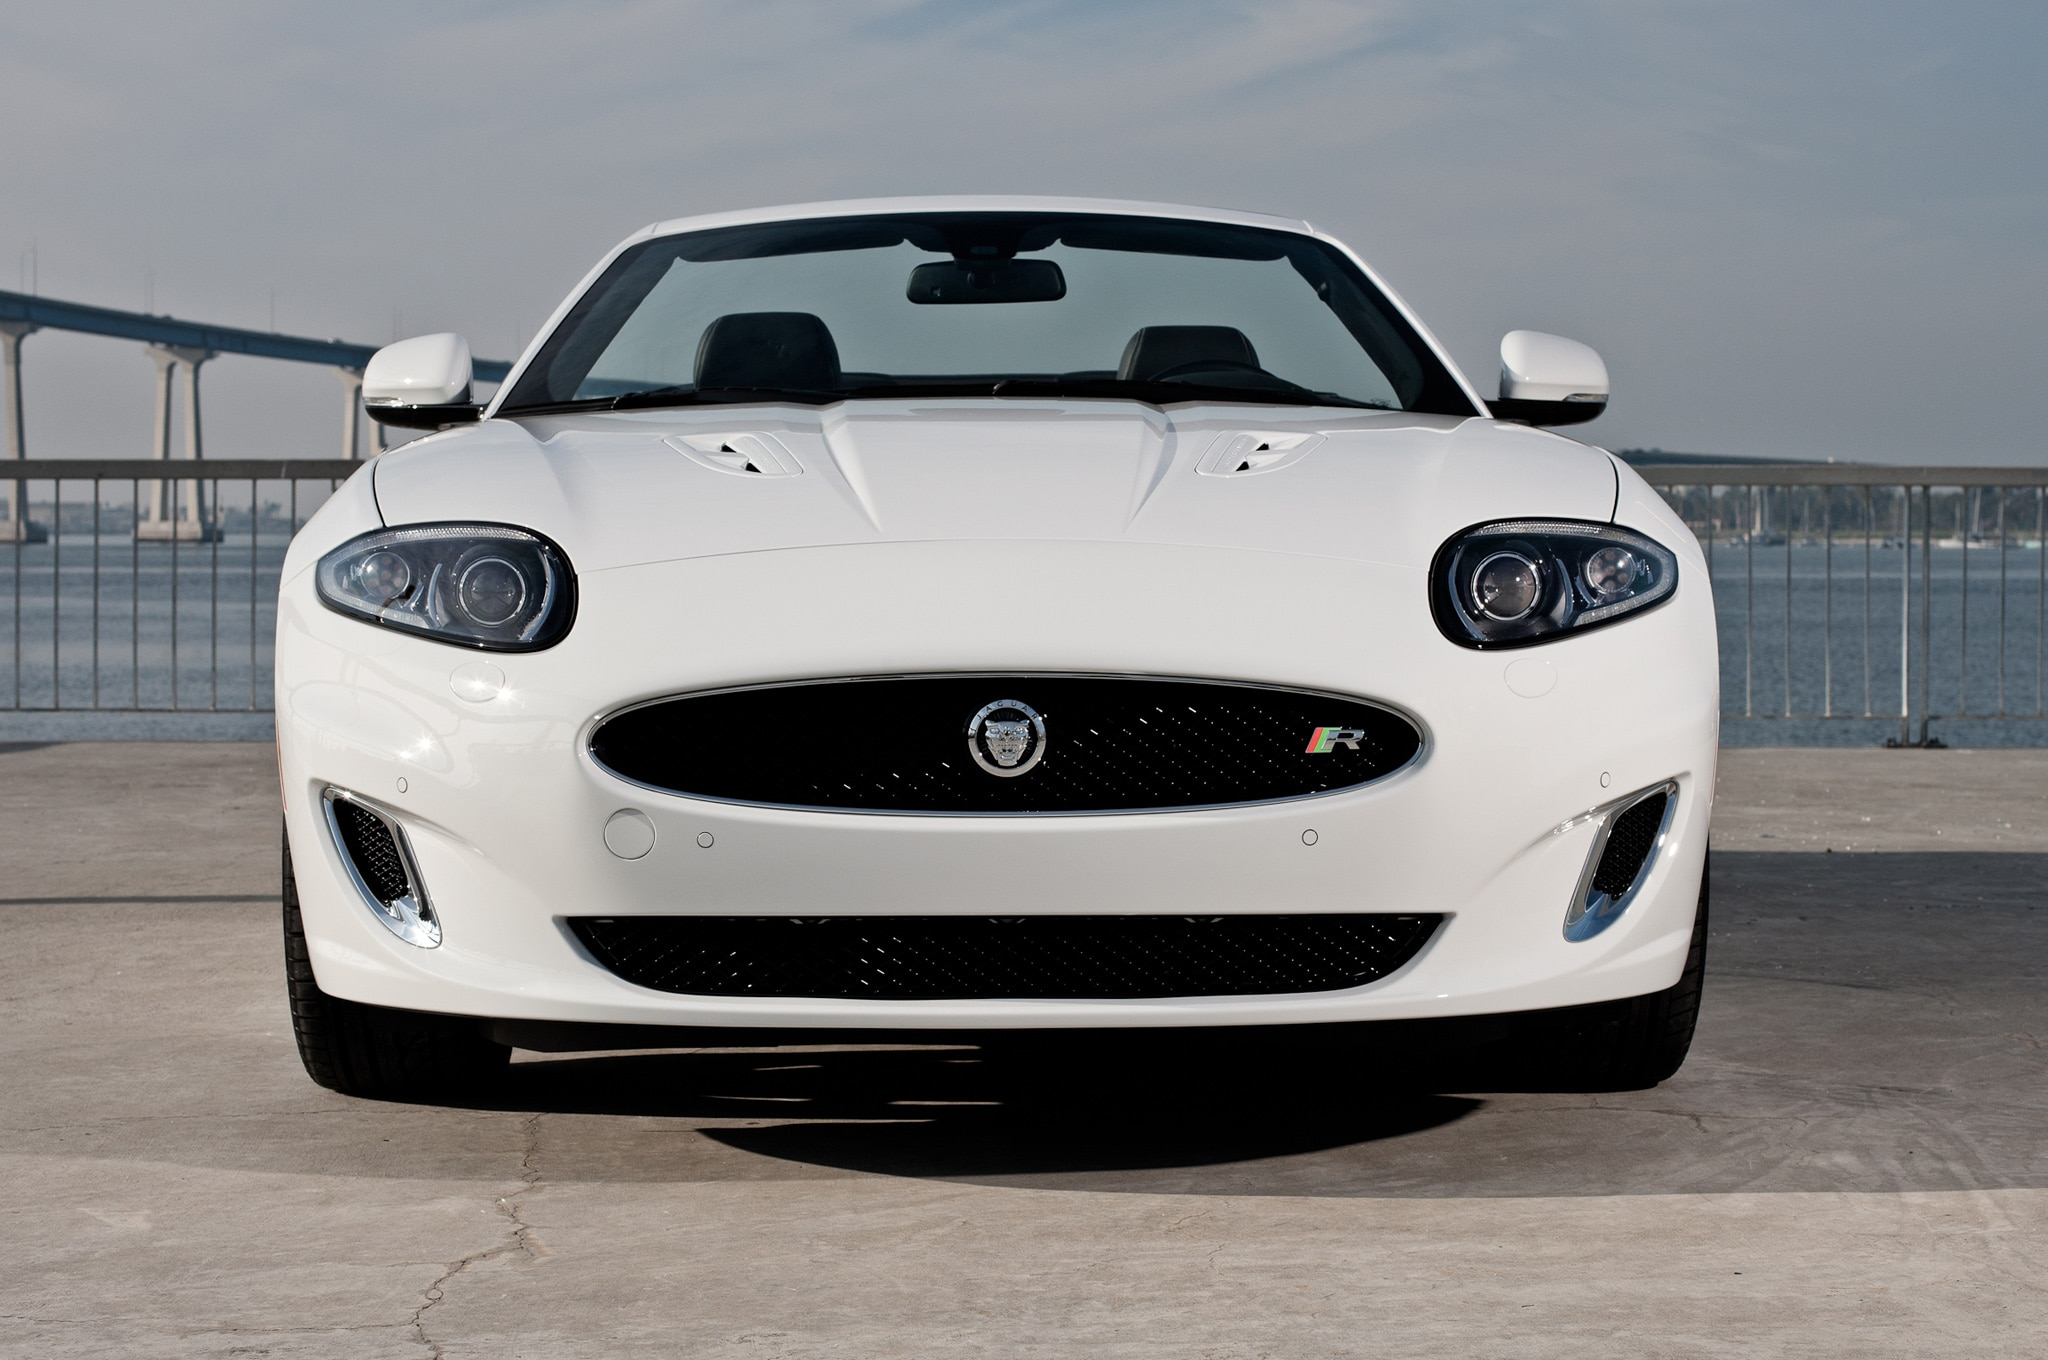 First Look: 2012 Jaguar XKR-S Convertible - Automobile ...